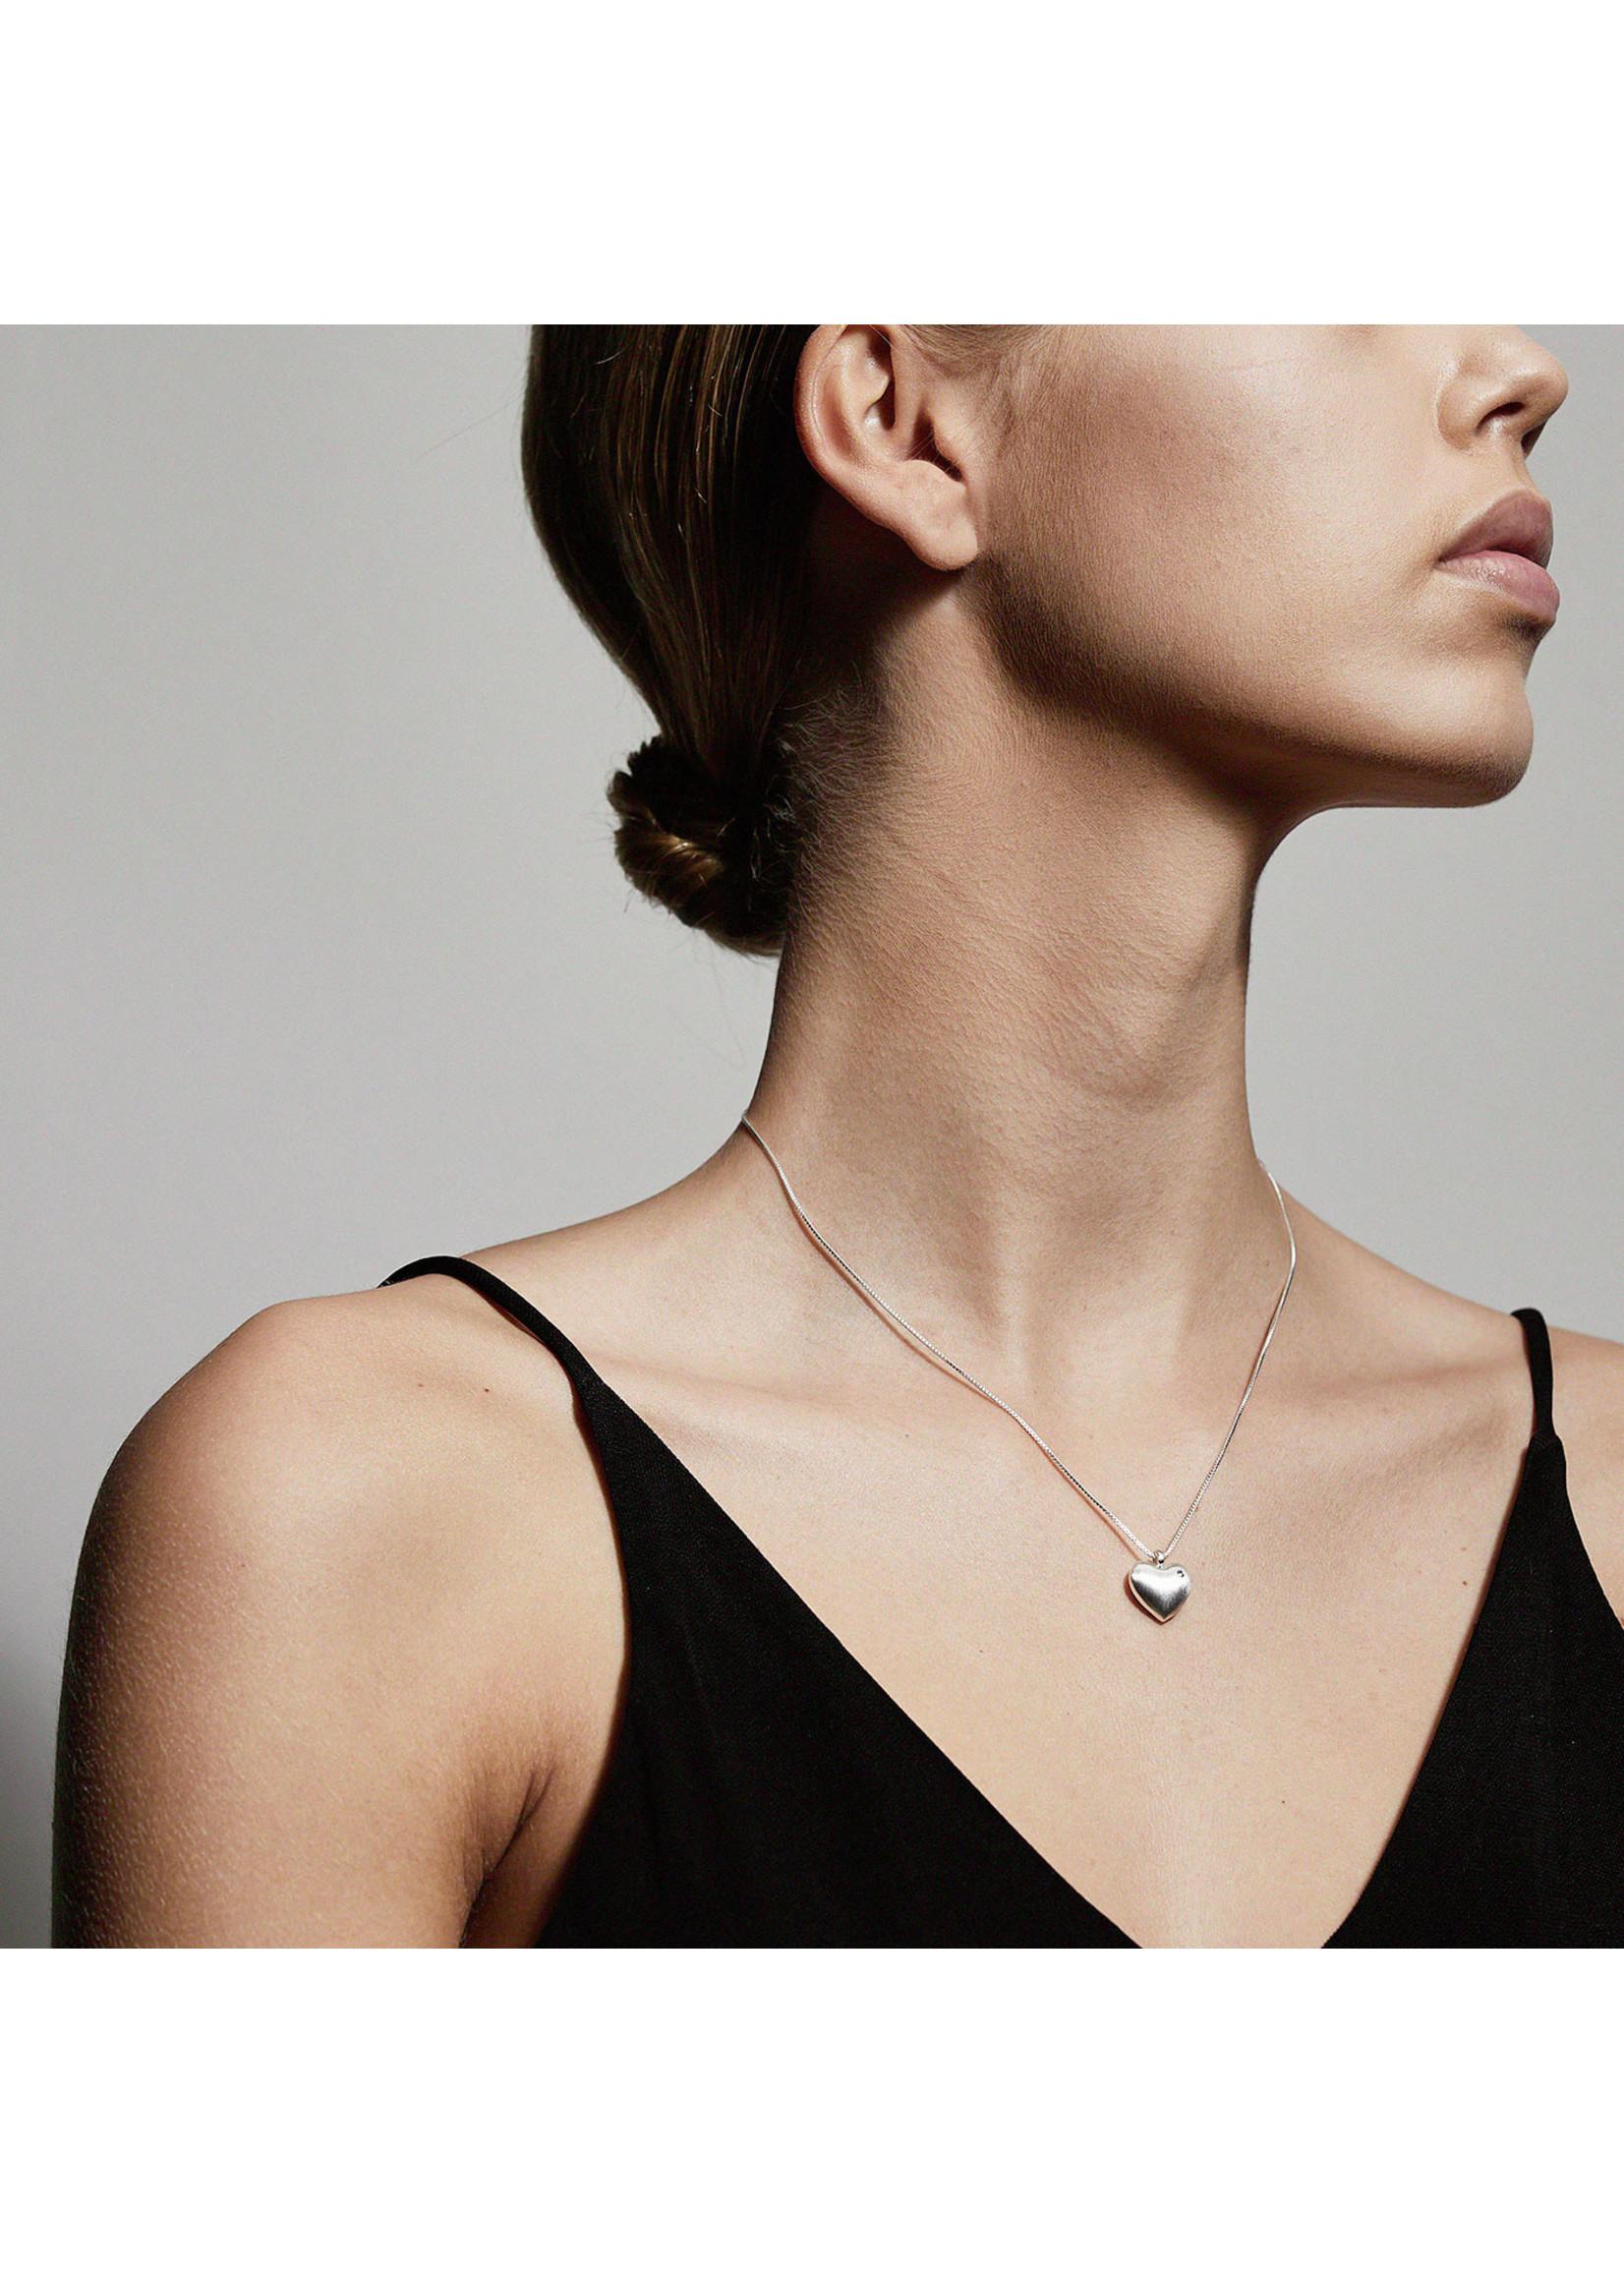 Pilgrim Jewellery Sophia Necklace - Silver